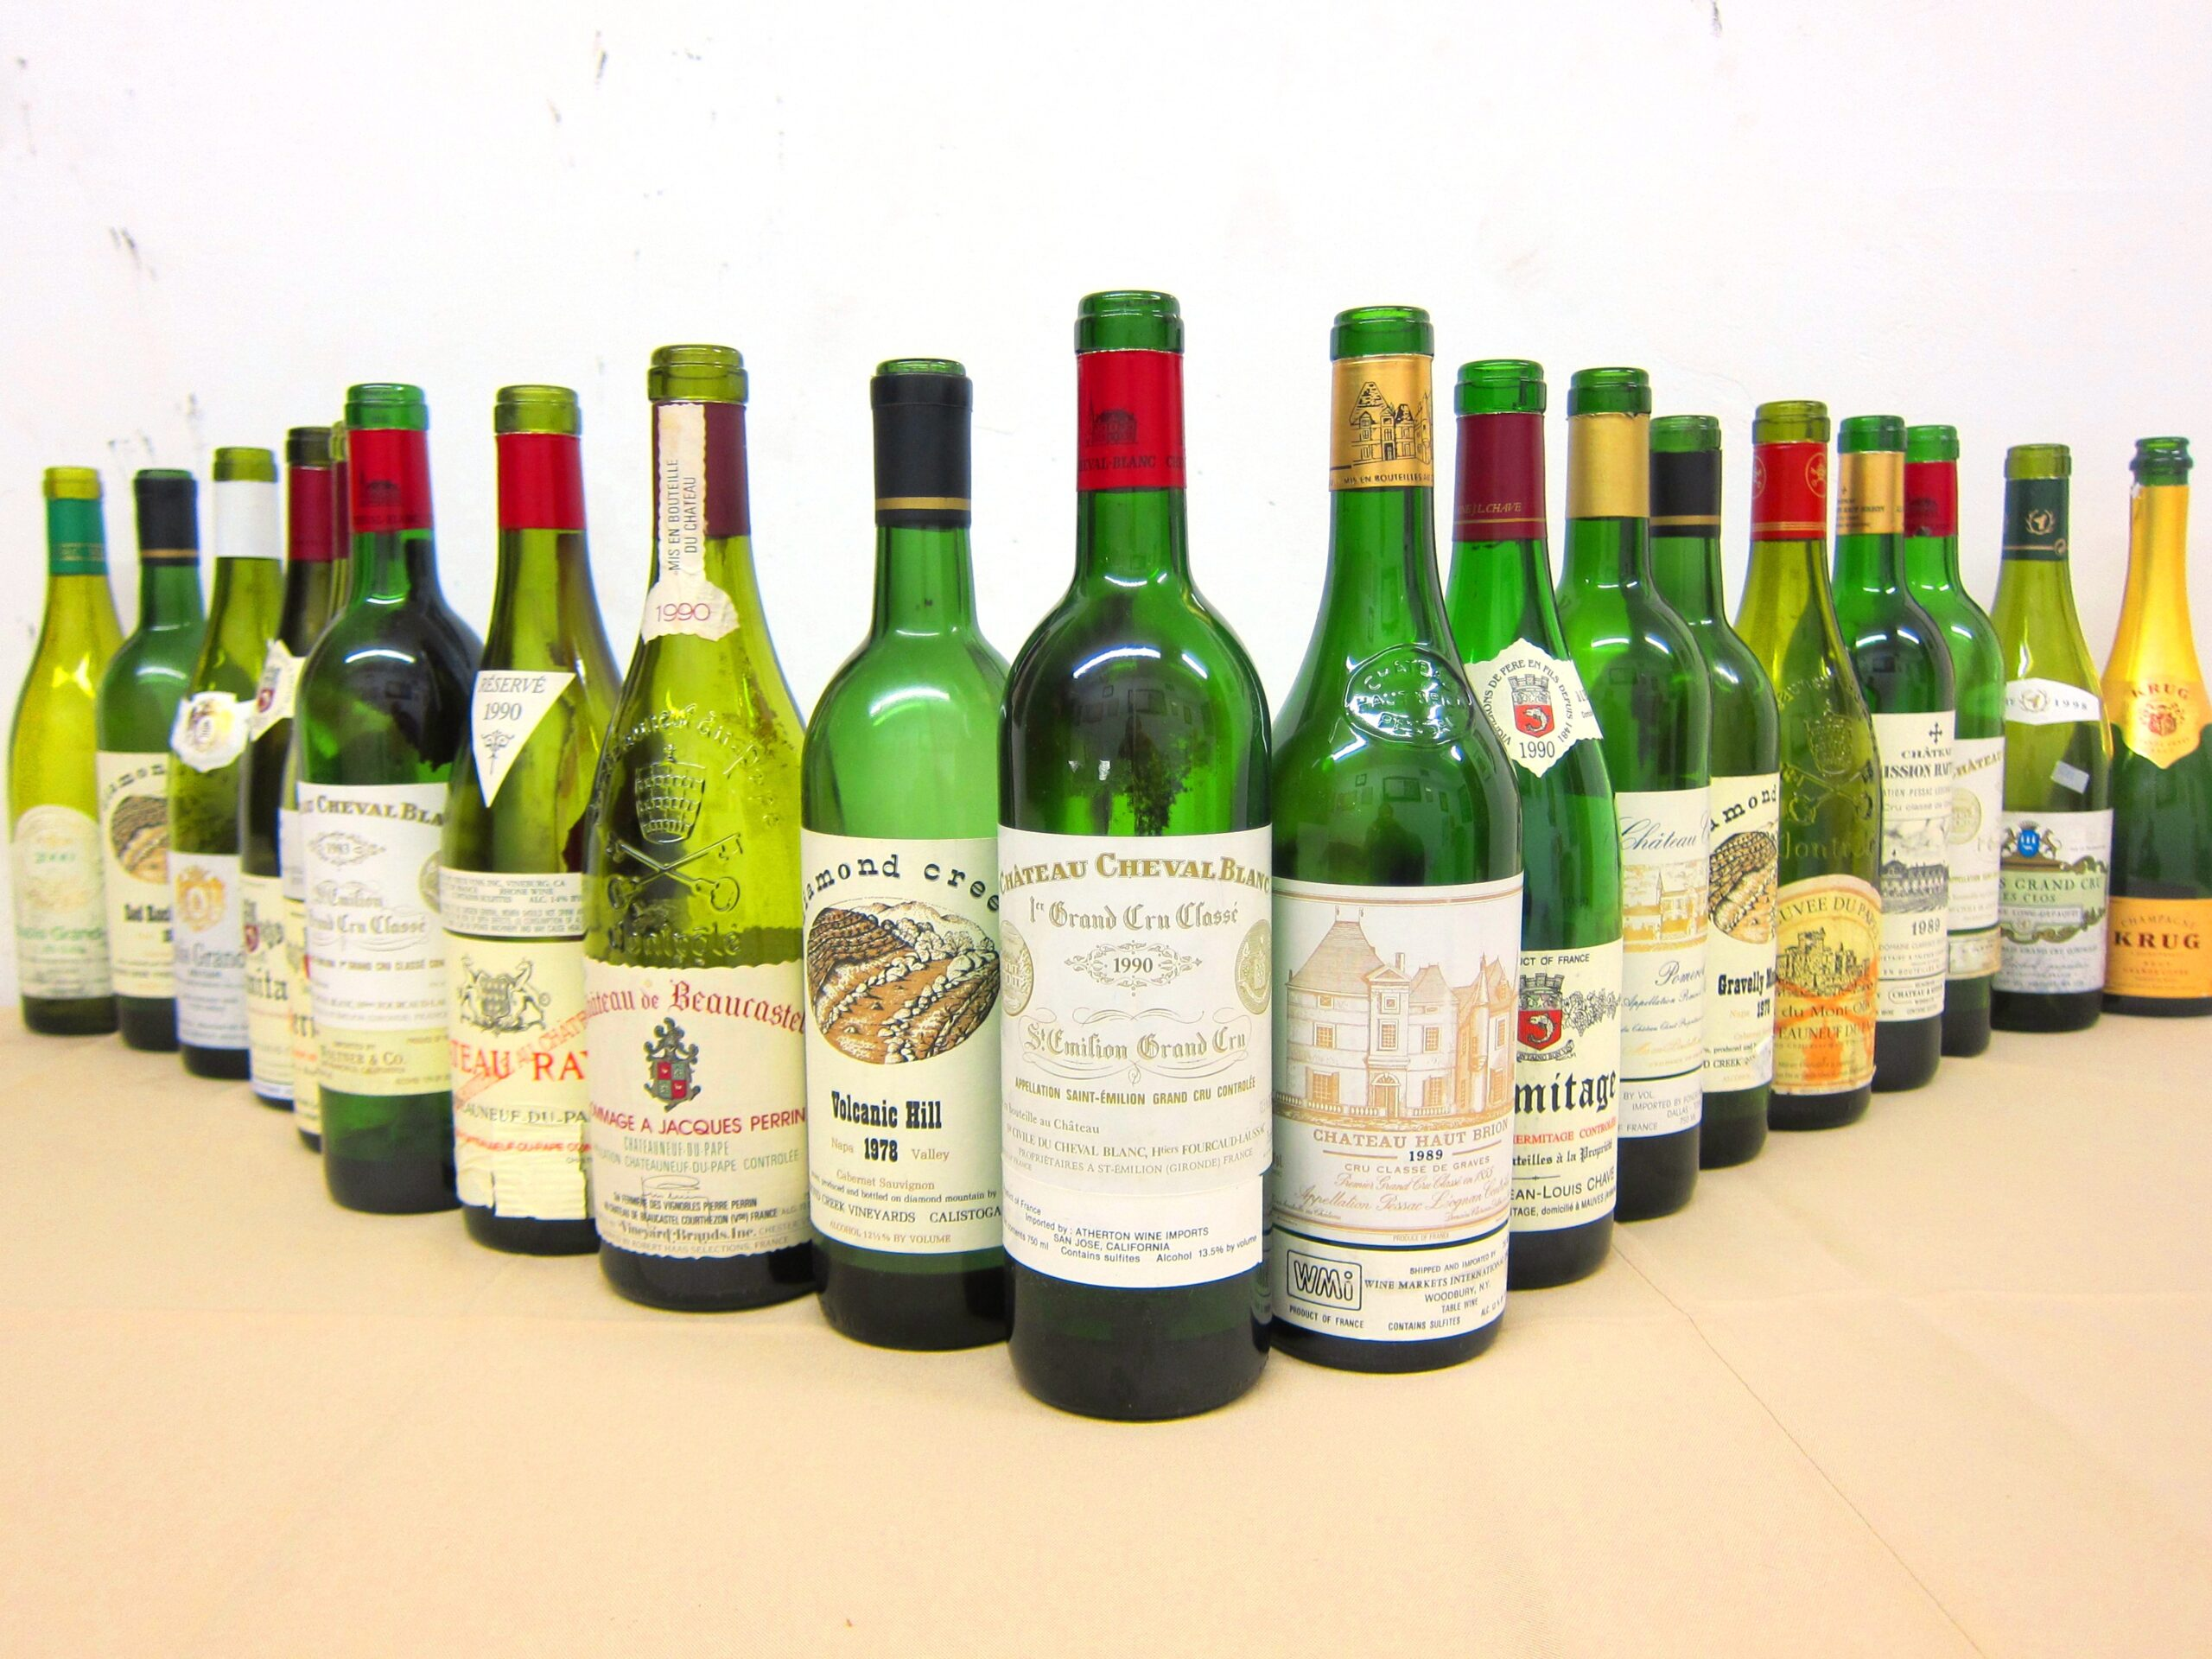 Blind Tasting Bordeaux Wine, Rhone Wine & More 7 Blind Men